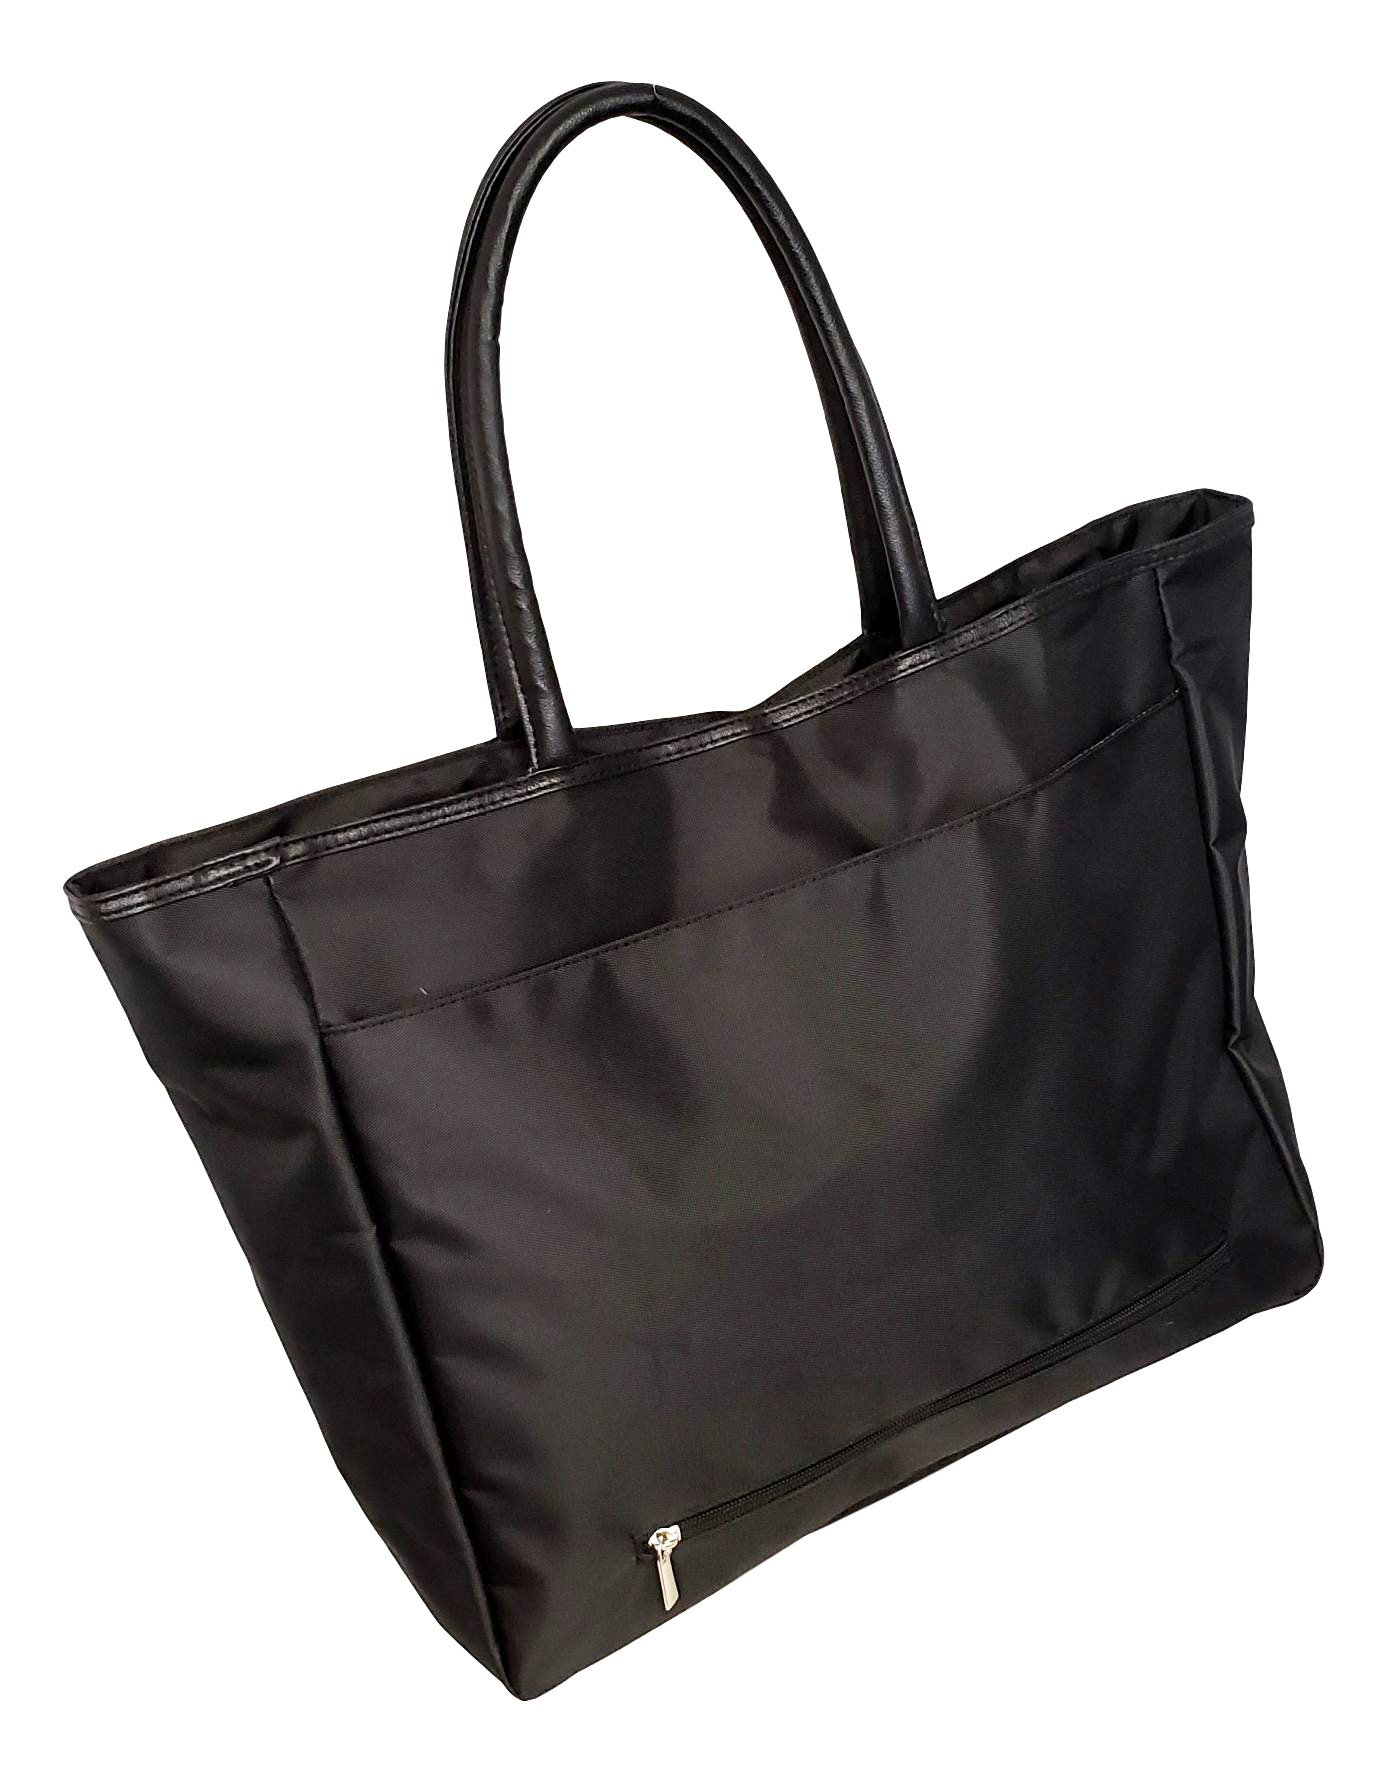 Large Black Organizing Travel Companion Purse Handbag Bag (No Embroidery - Black)